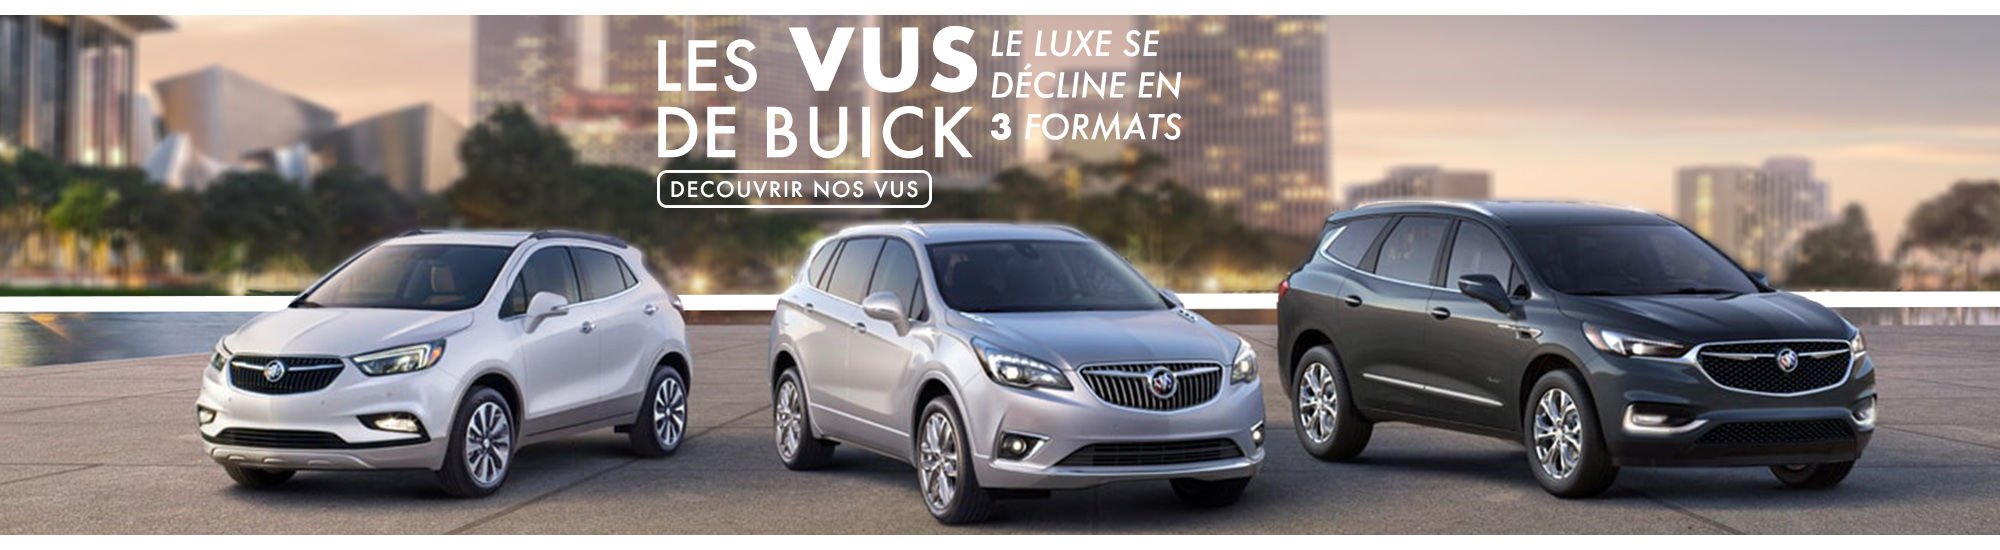 Buick VUS 2019